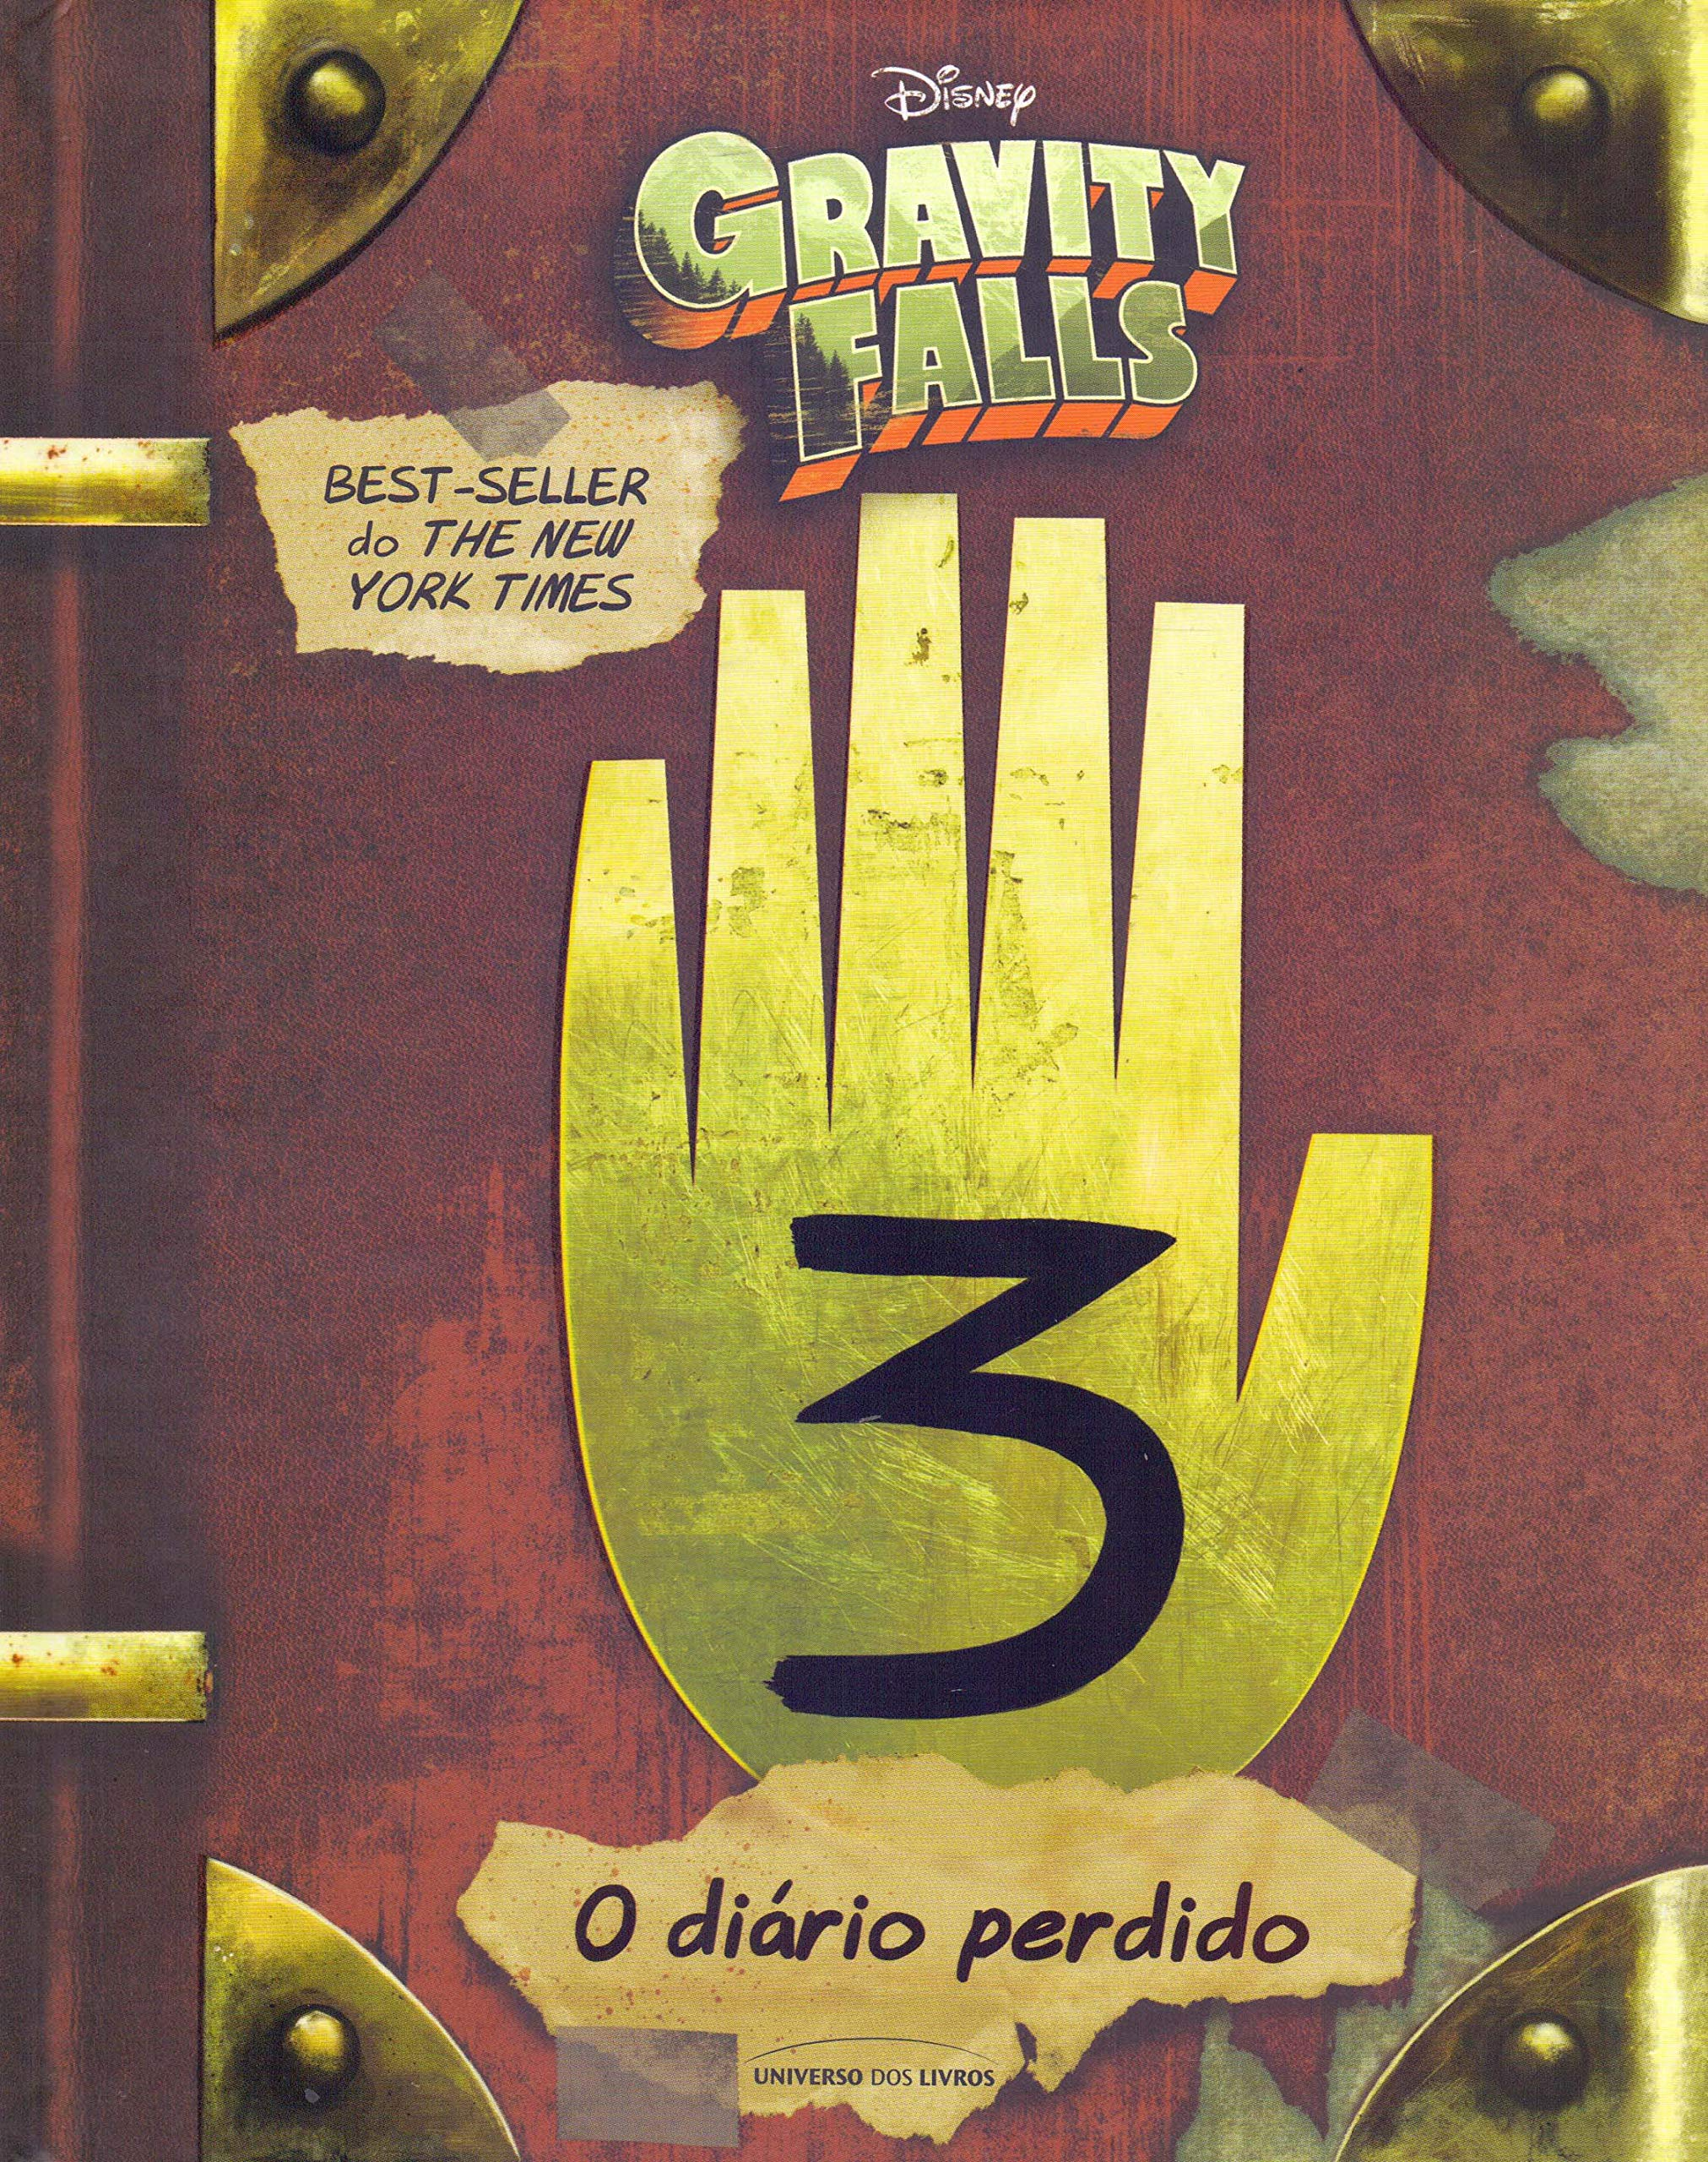 Diario De Gravity Falls 1 Pdf - Libros Favorito